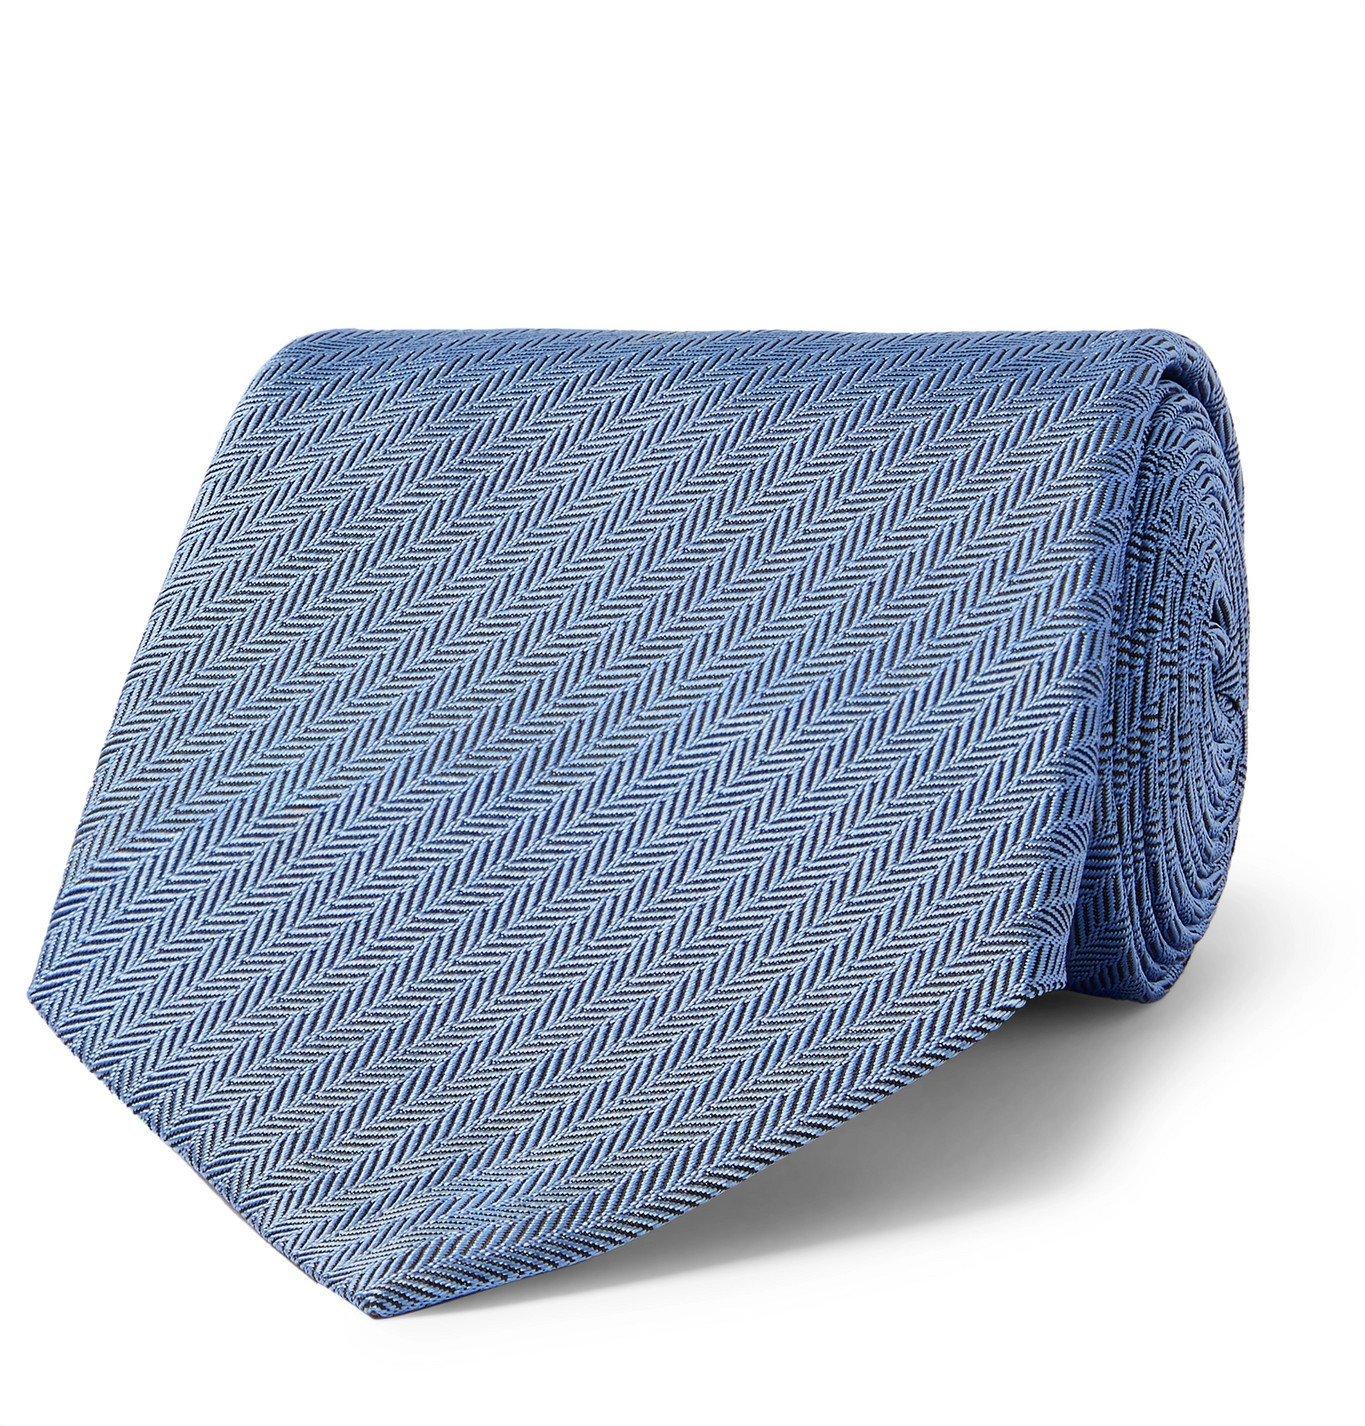 Dunhill - 8.5cm Herringbone Mulberry Silk Tie - Blue